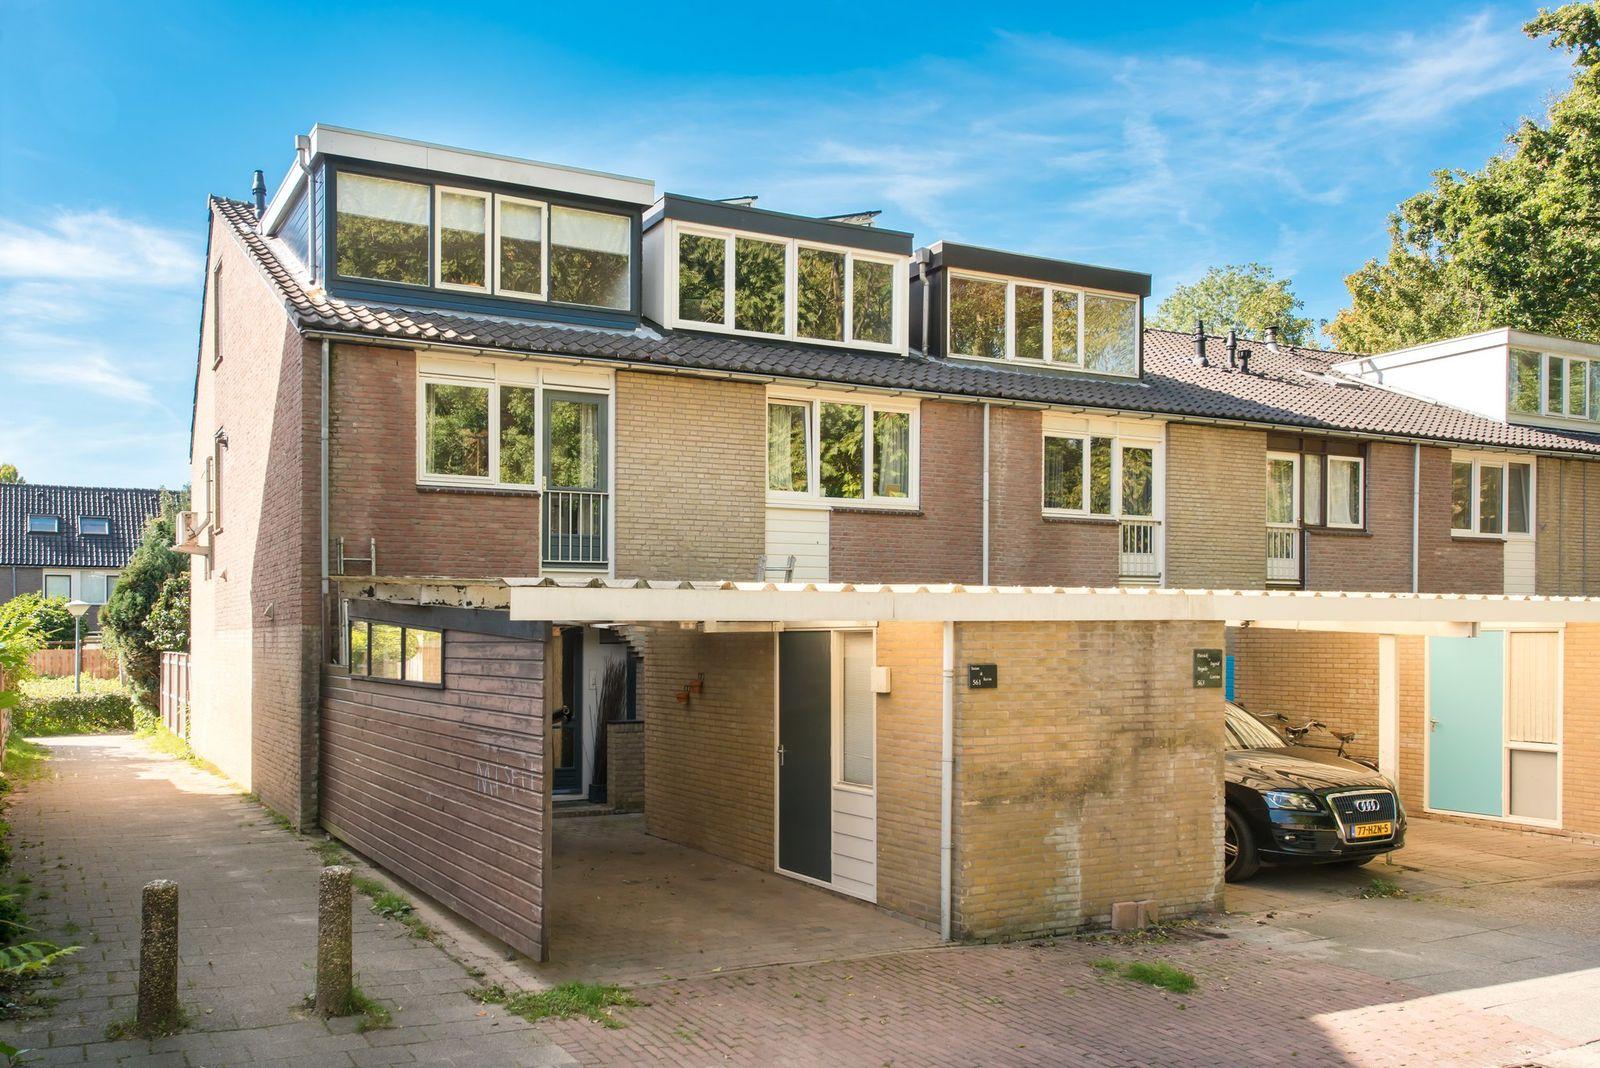 Tarthorst 561, Wageningen